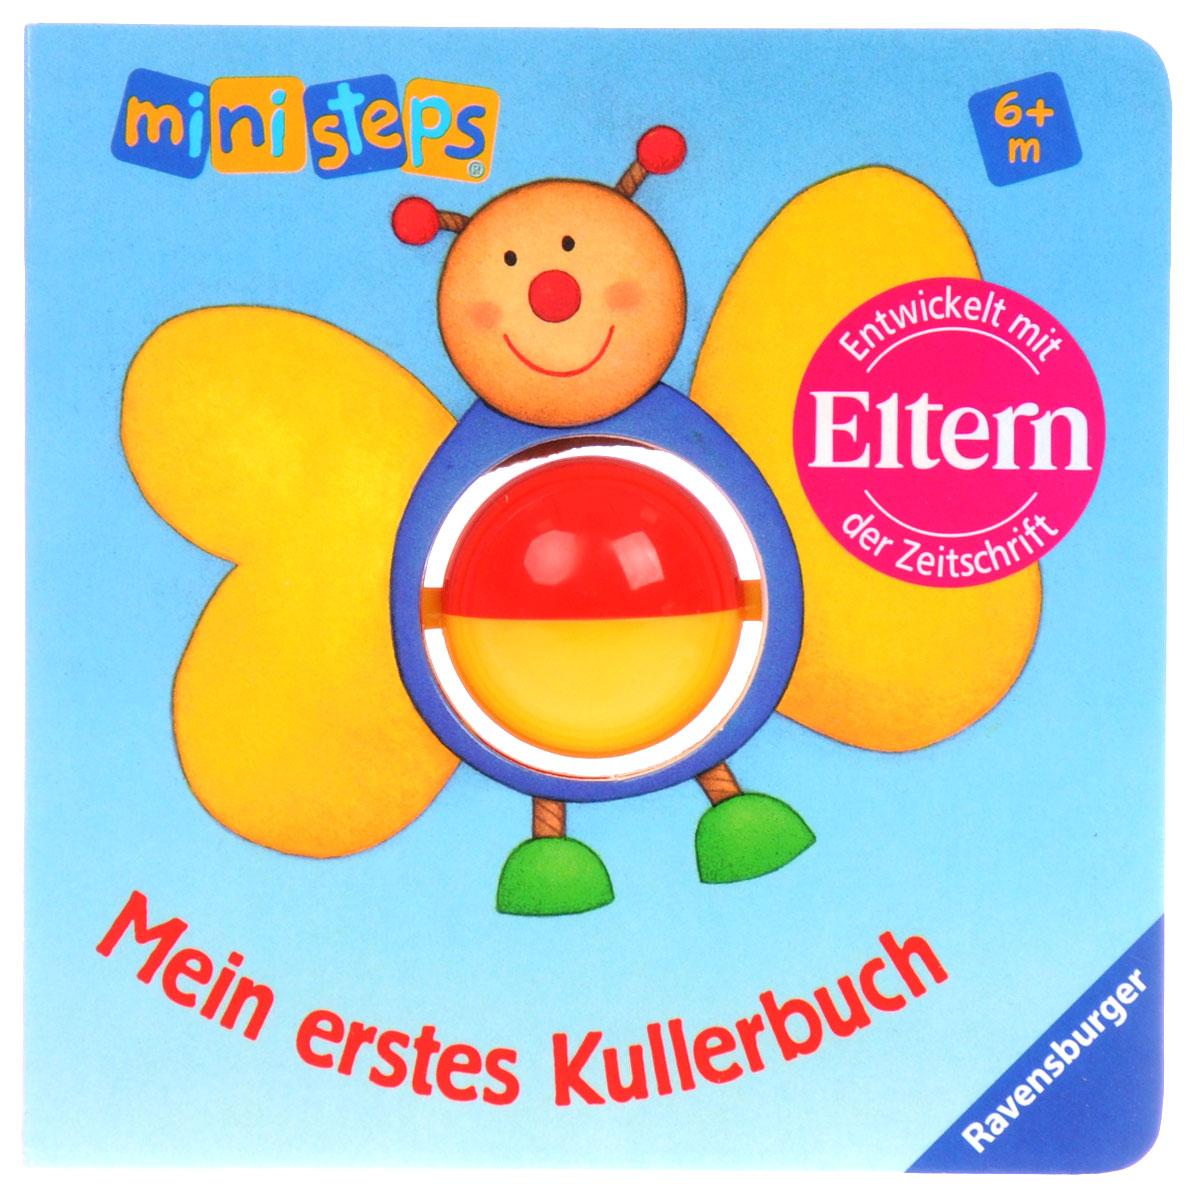 Ministeps: Mein Erstes Kullerbuch